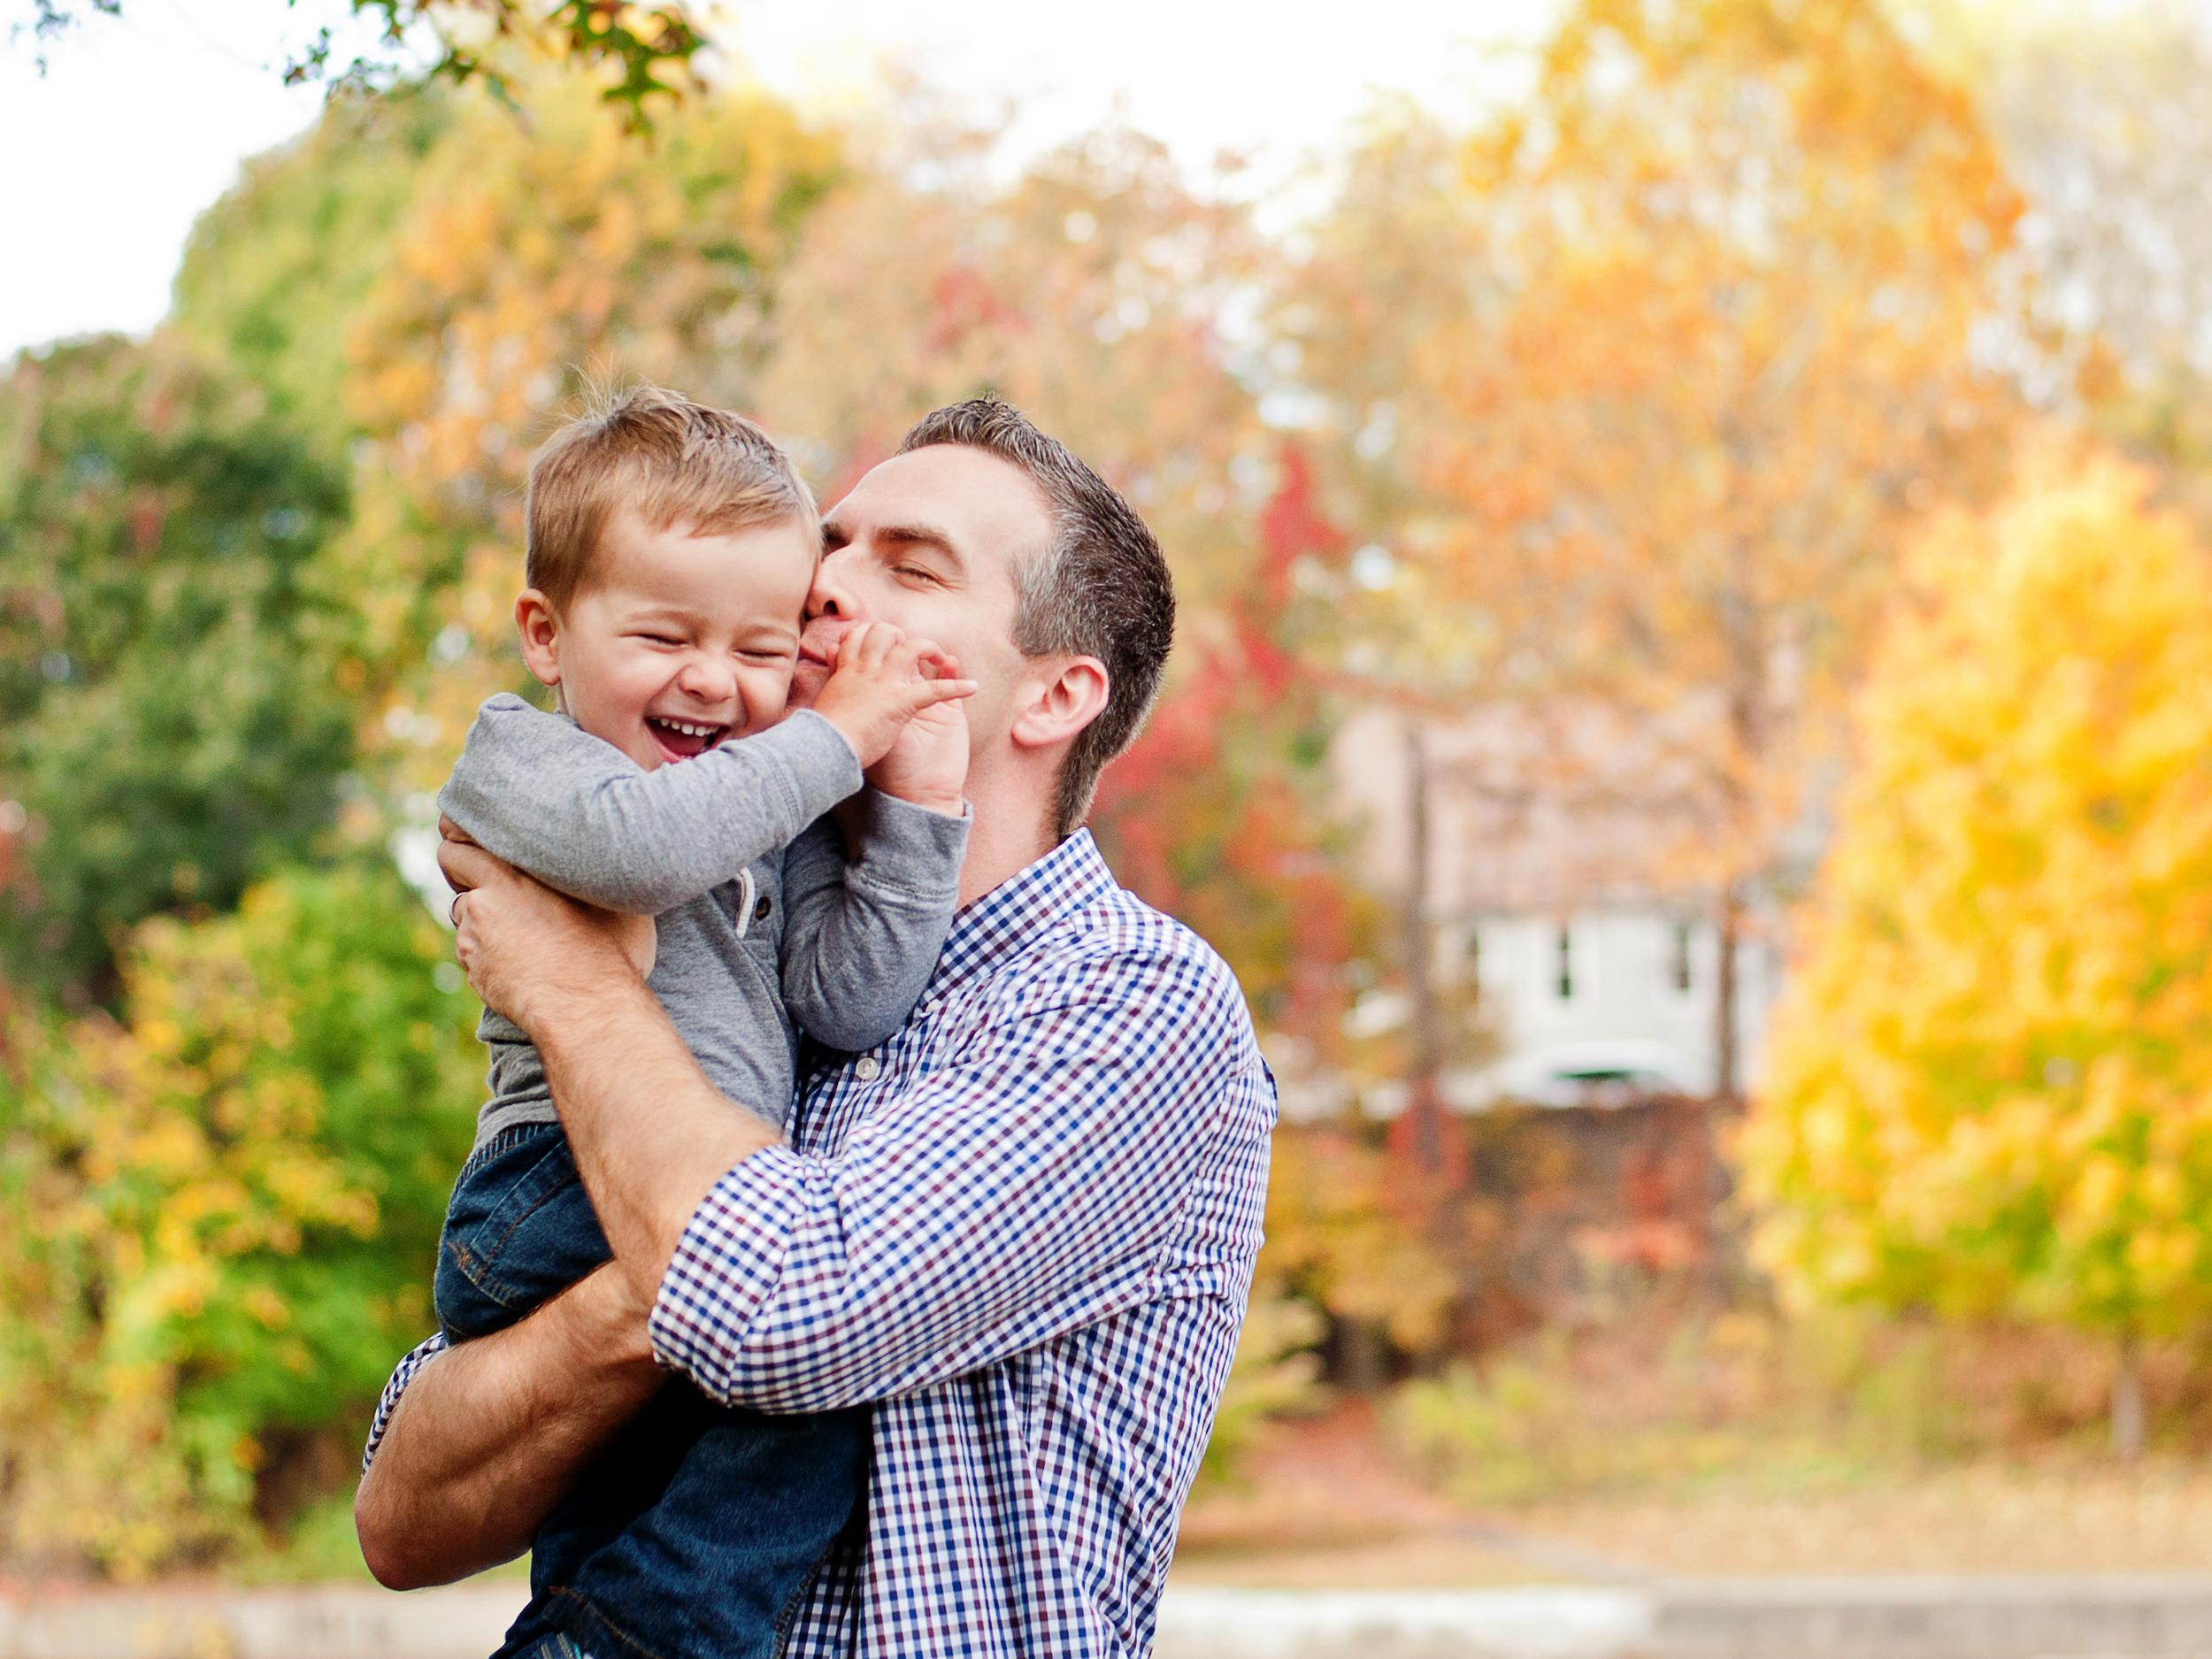 Matthew and his son Nathan